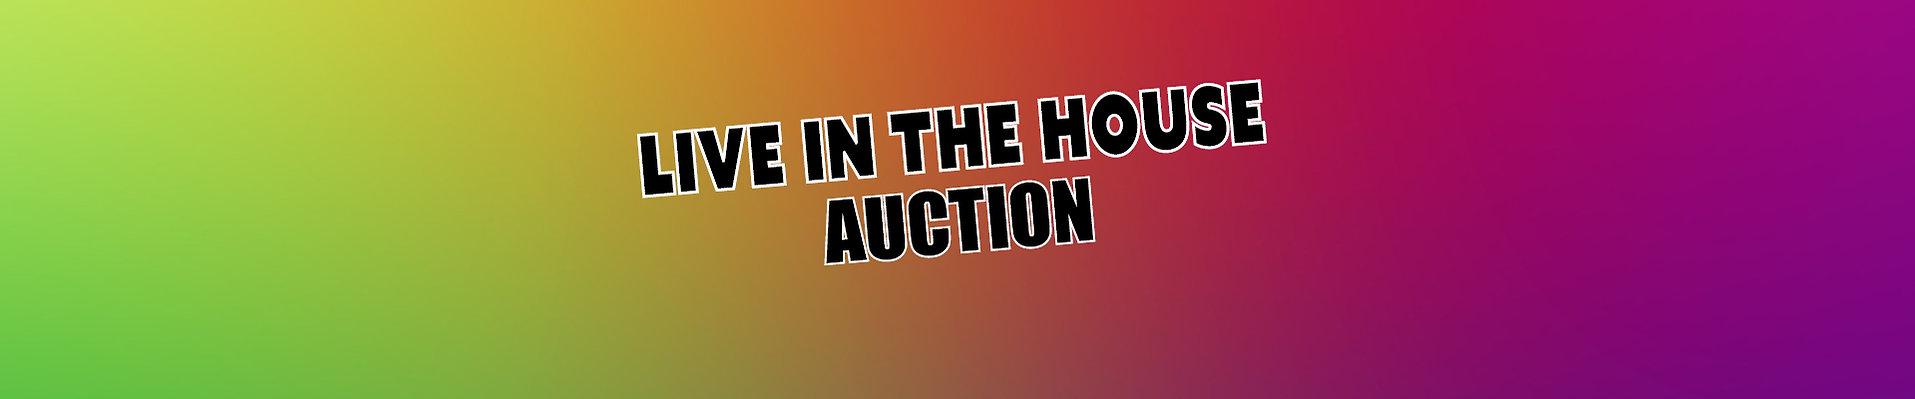 web banner Auction.jpg